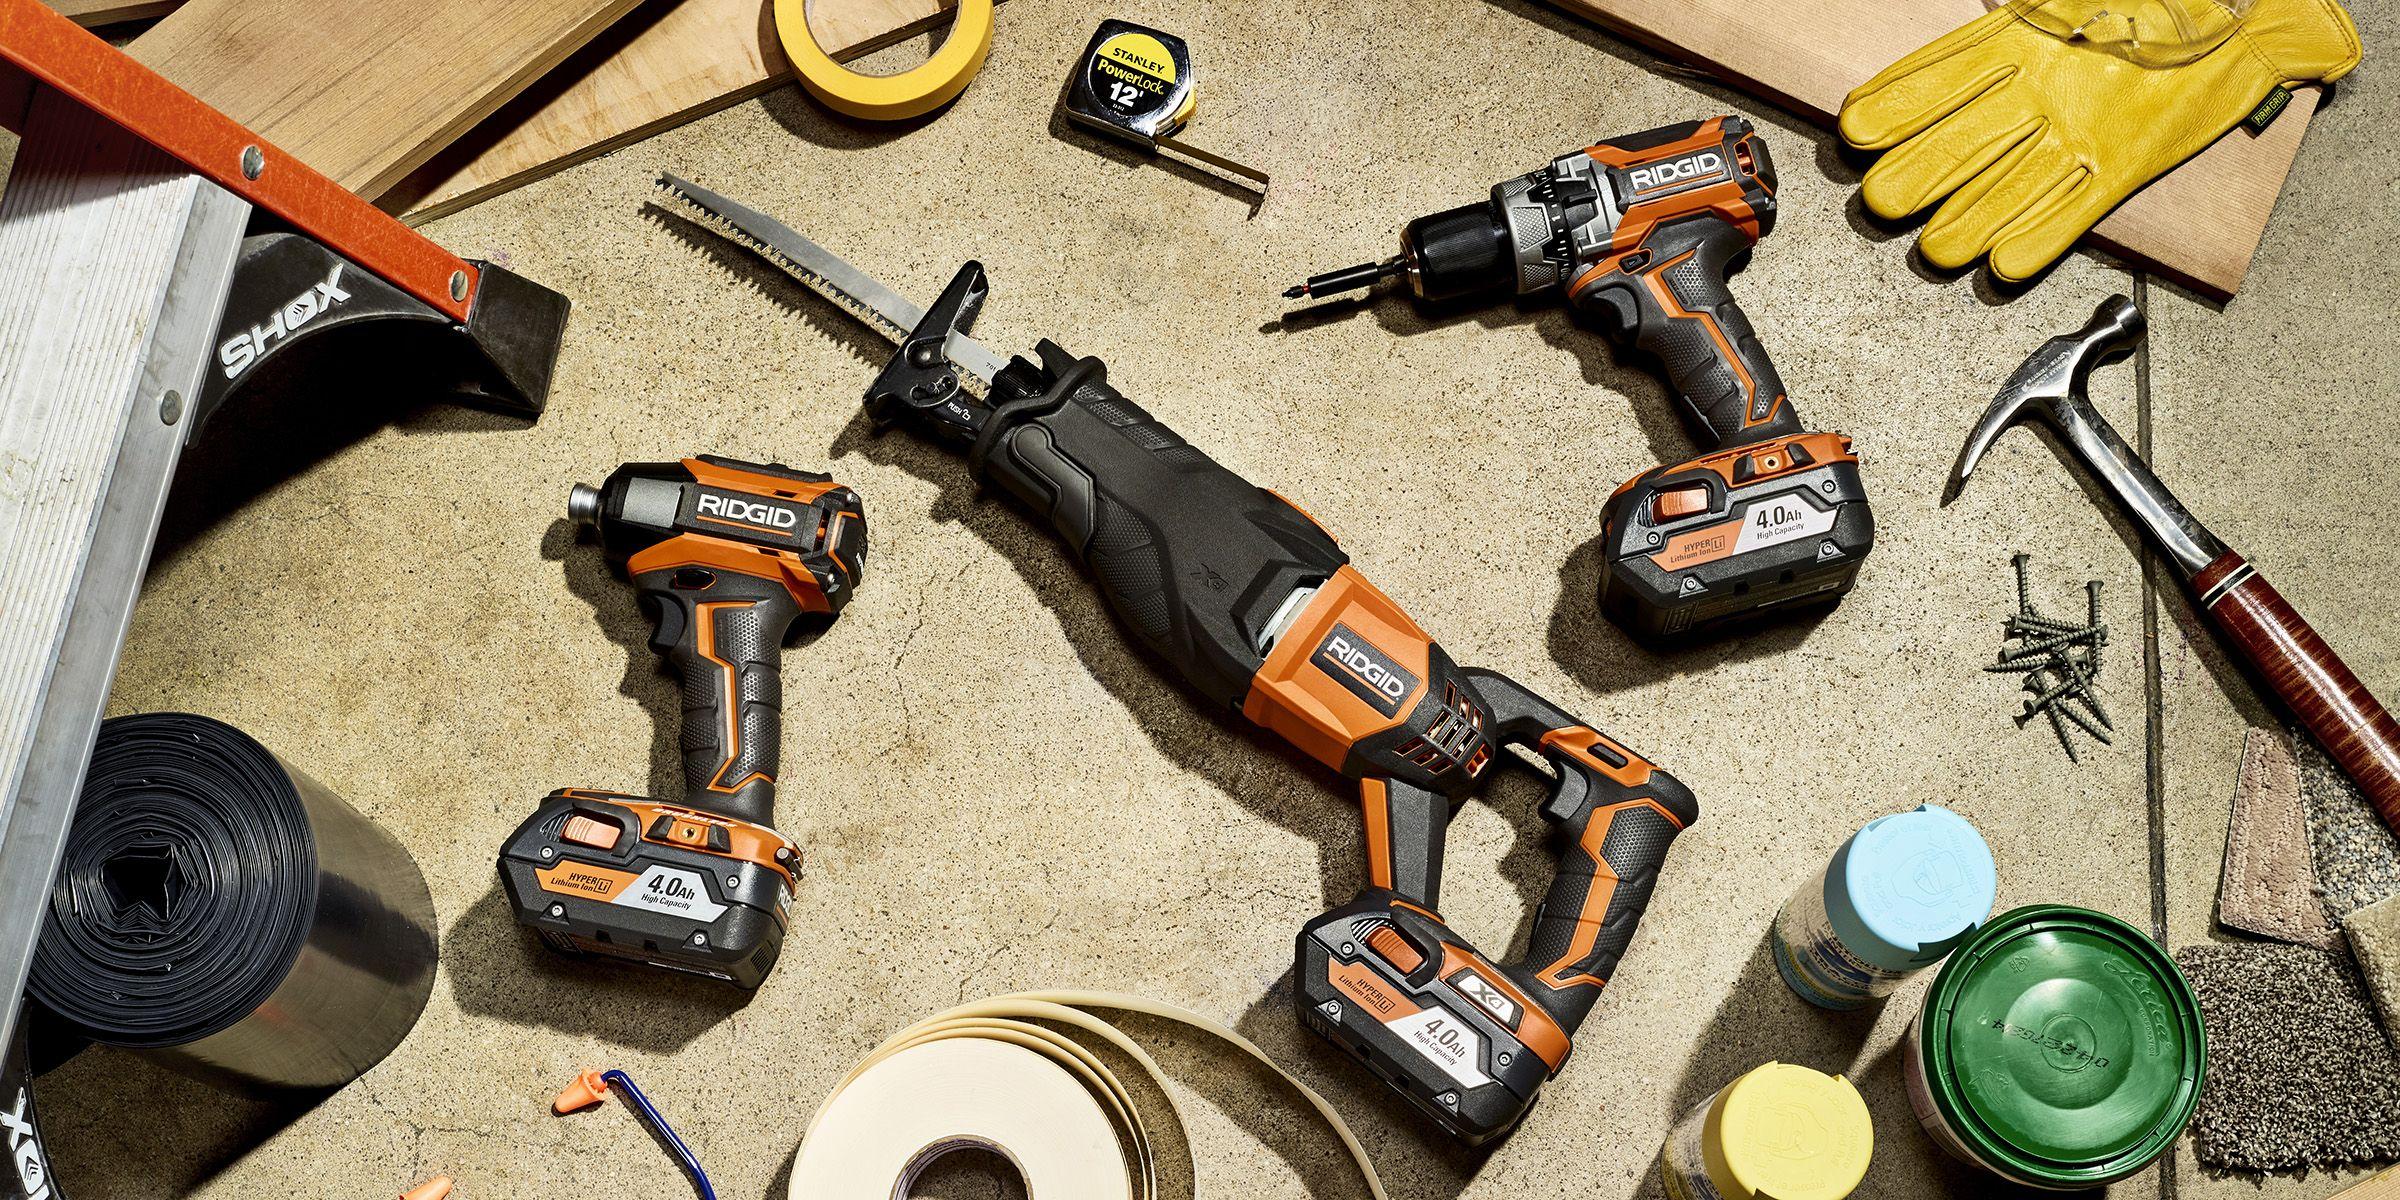 Common repairs every homeowner needs to master